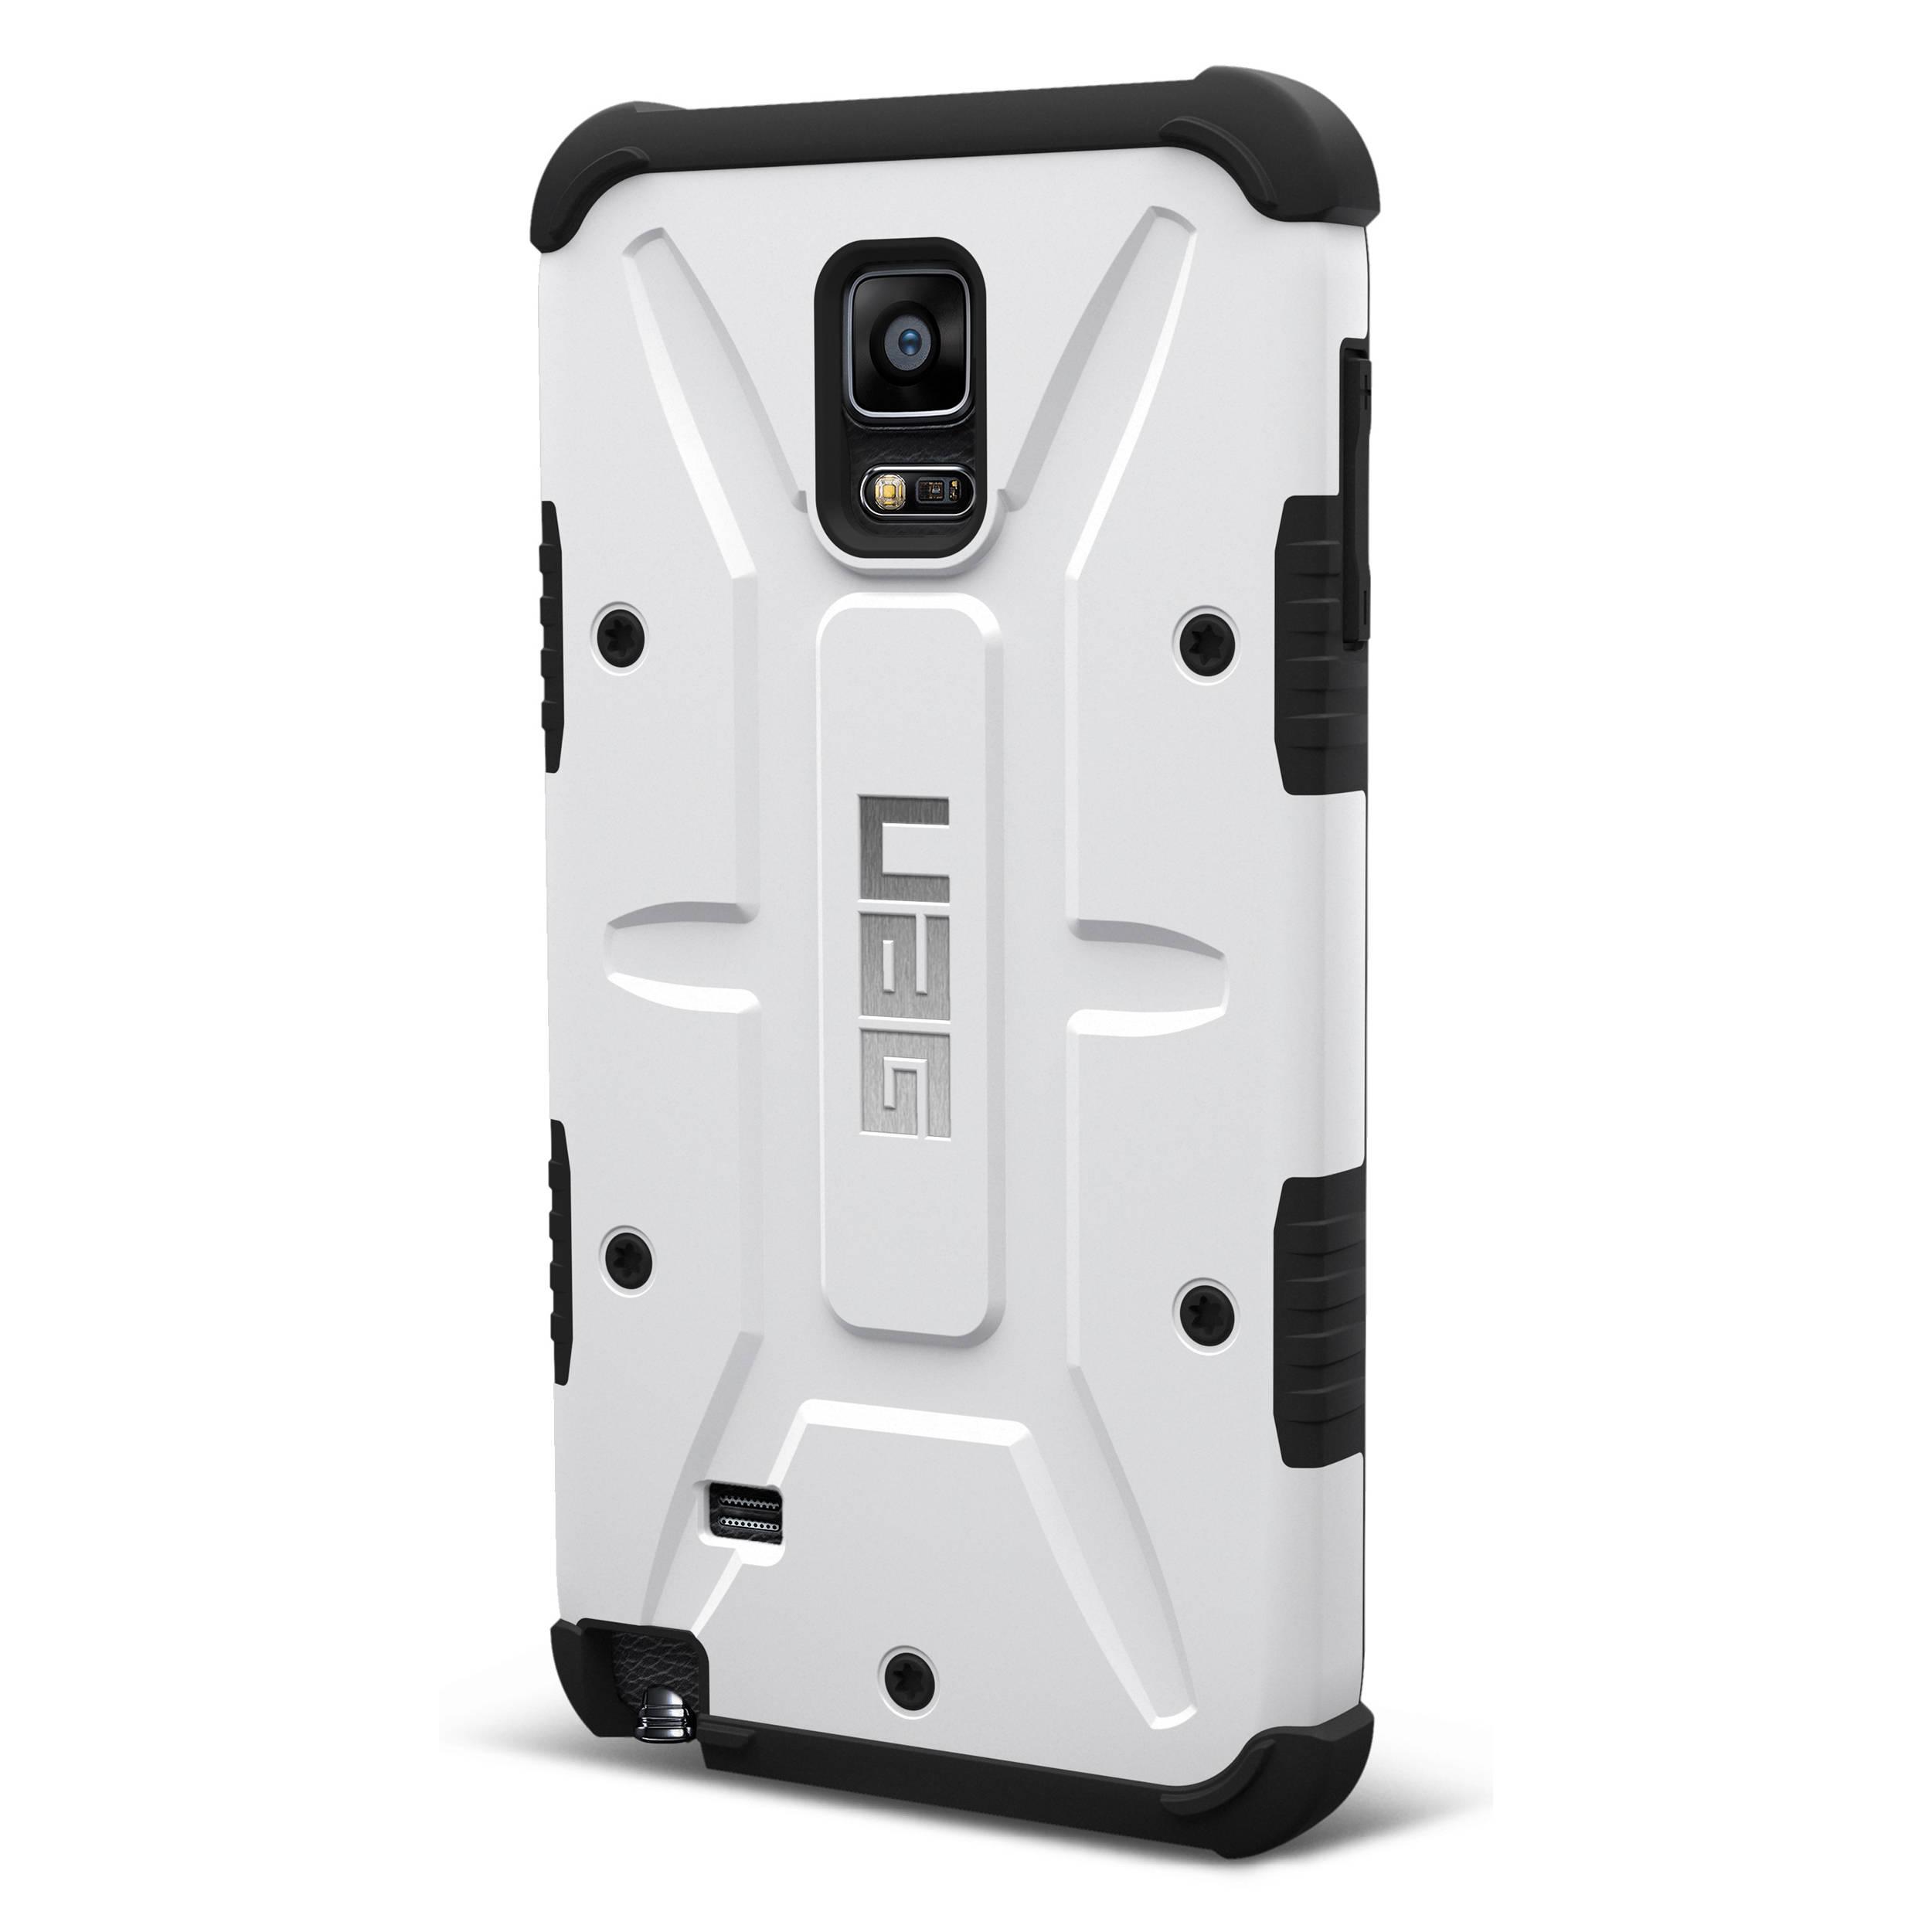 uk availability 5e743 c8ed0 Urban Armor Gear Composite Case for Galaxy Note 4 (White)